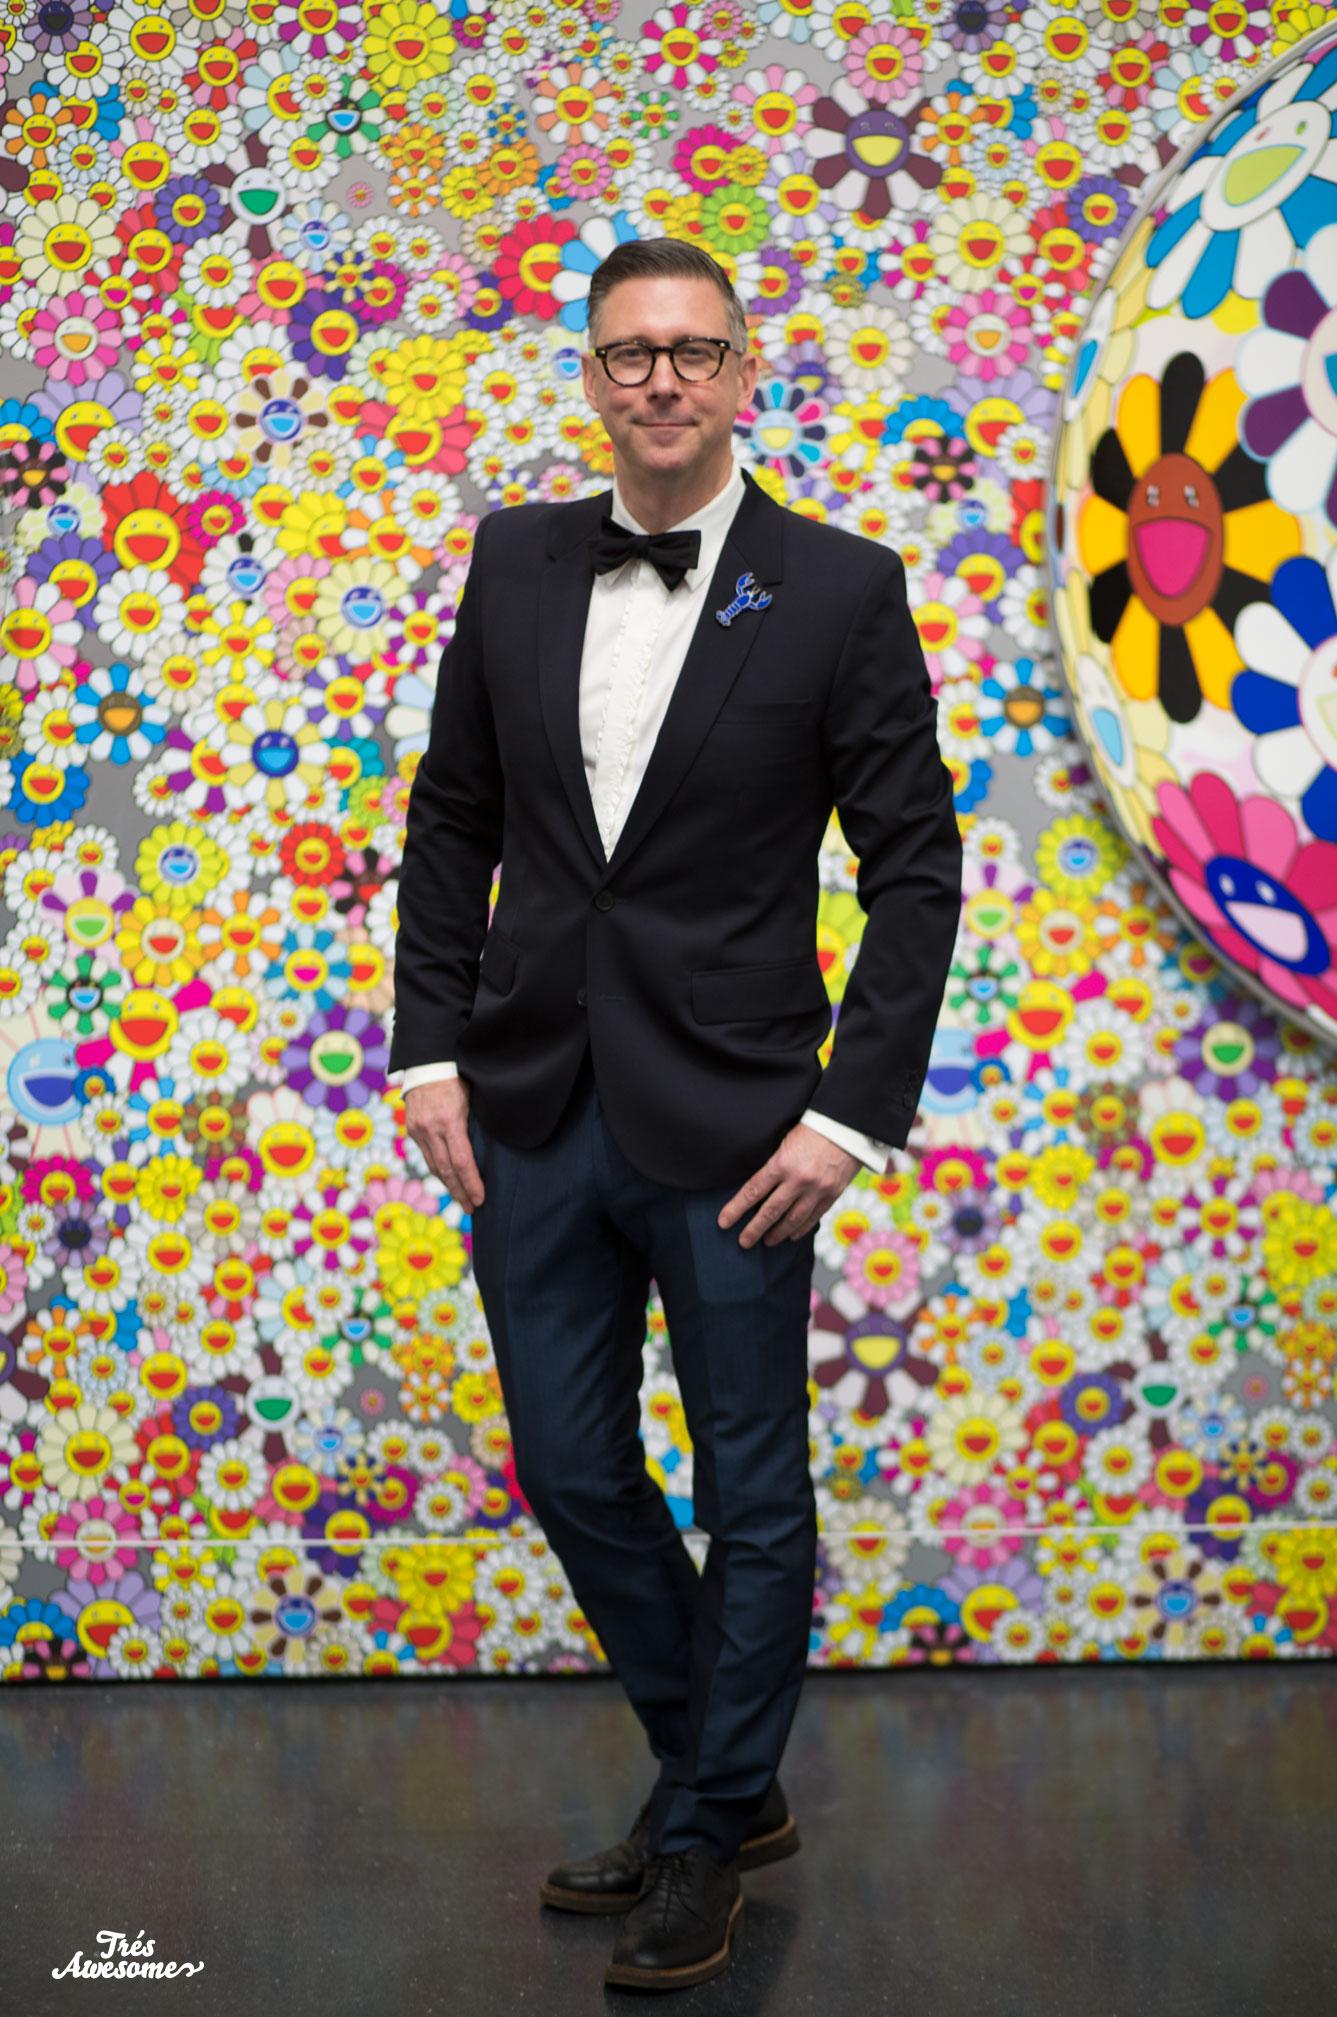 David Syrek, Fashion Director of the Chicago Tribune